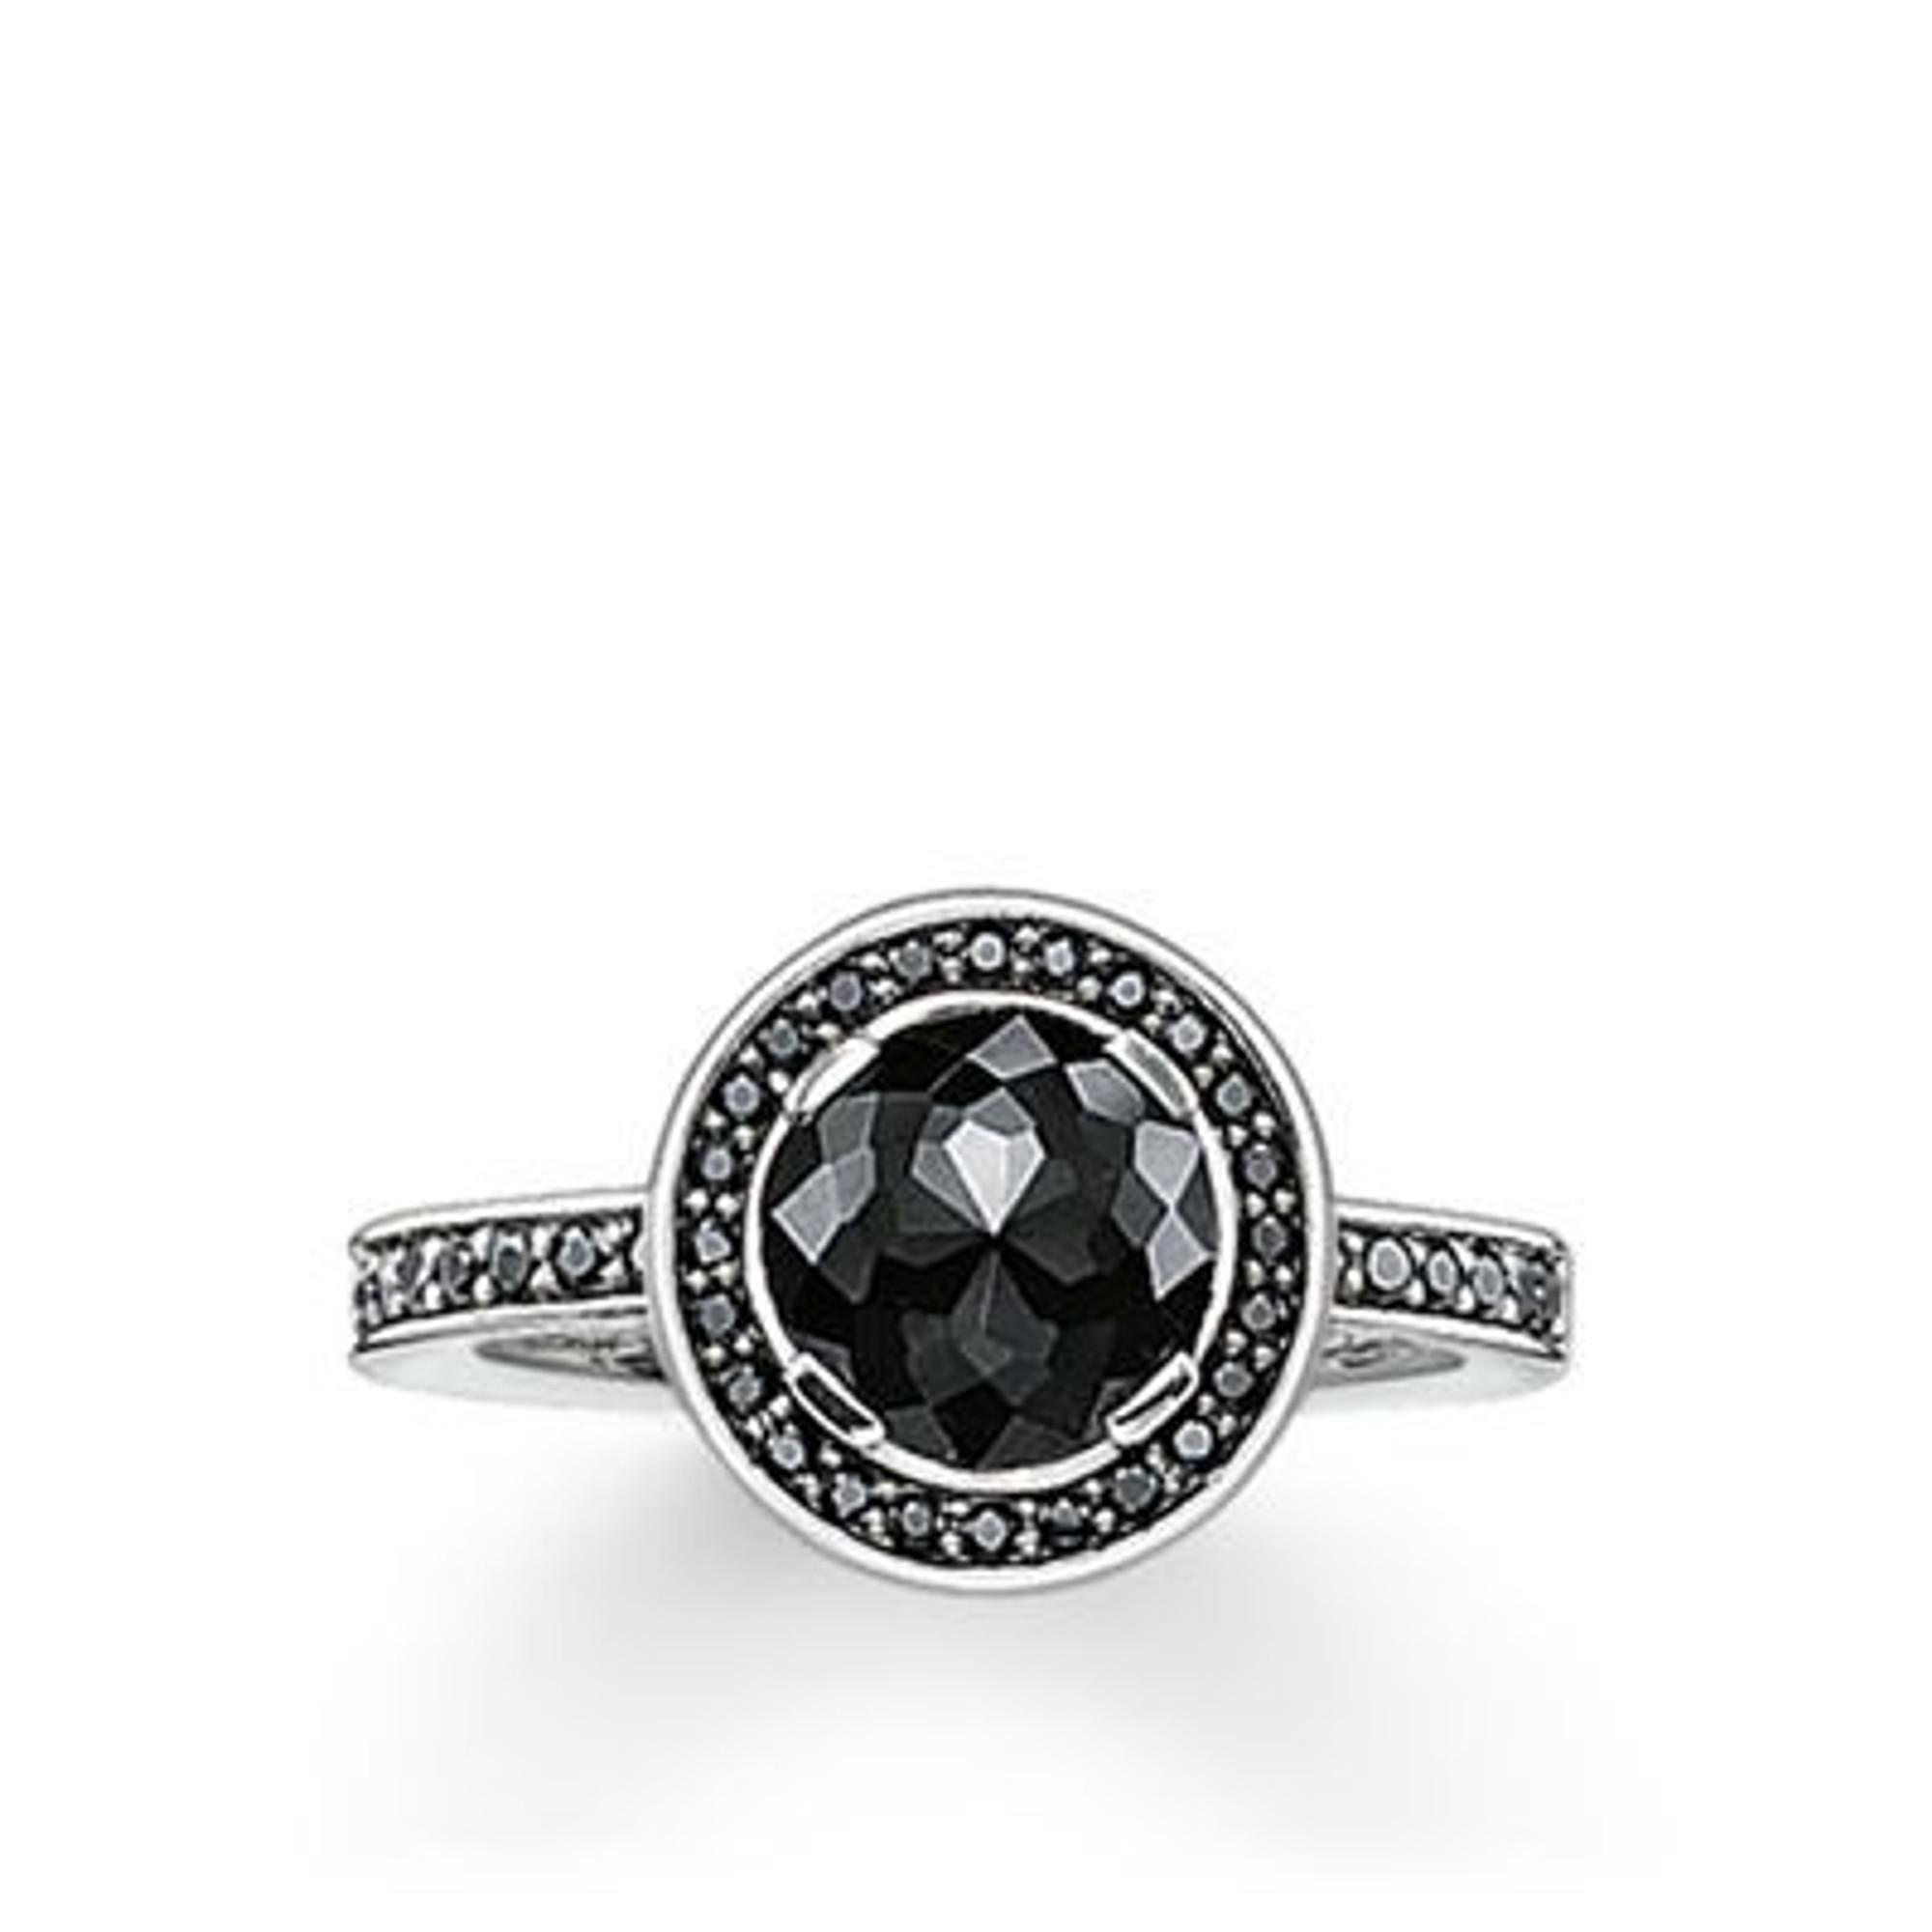 THOMAS SABO Ring TR1971-051-11-56